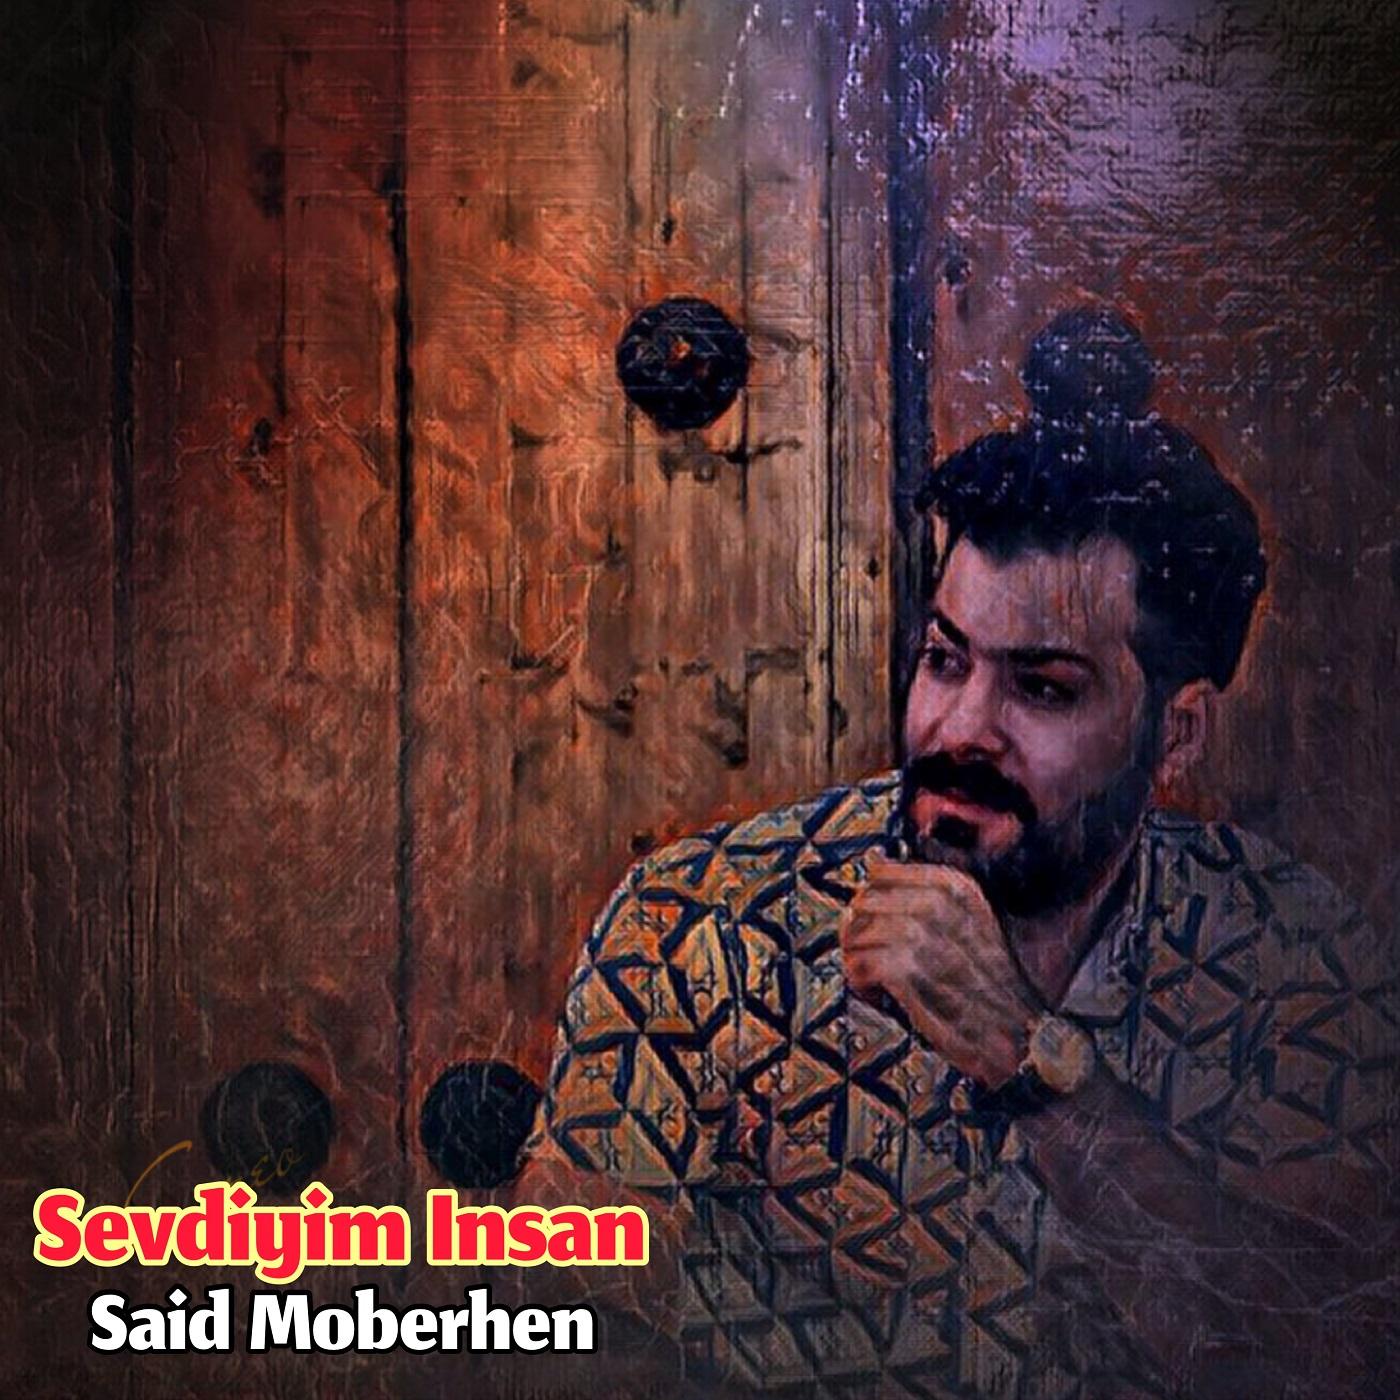 https://s16.picofile.com/file/8426290884/14Said_Moberhen_Sevdiyim_Insan.jpg